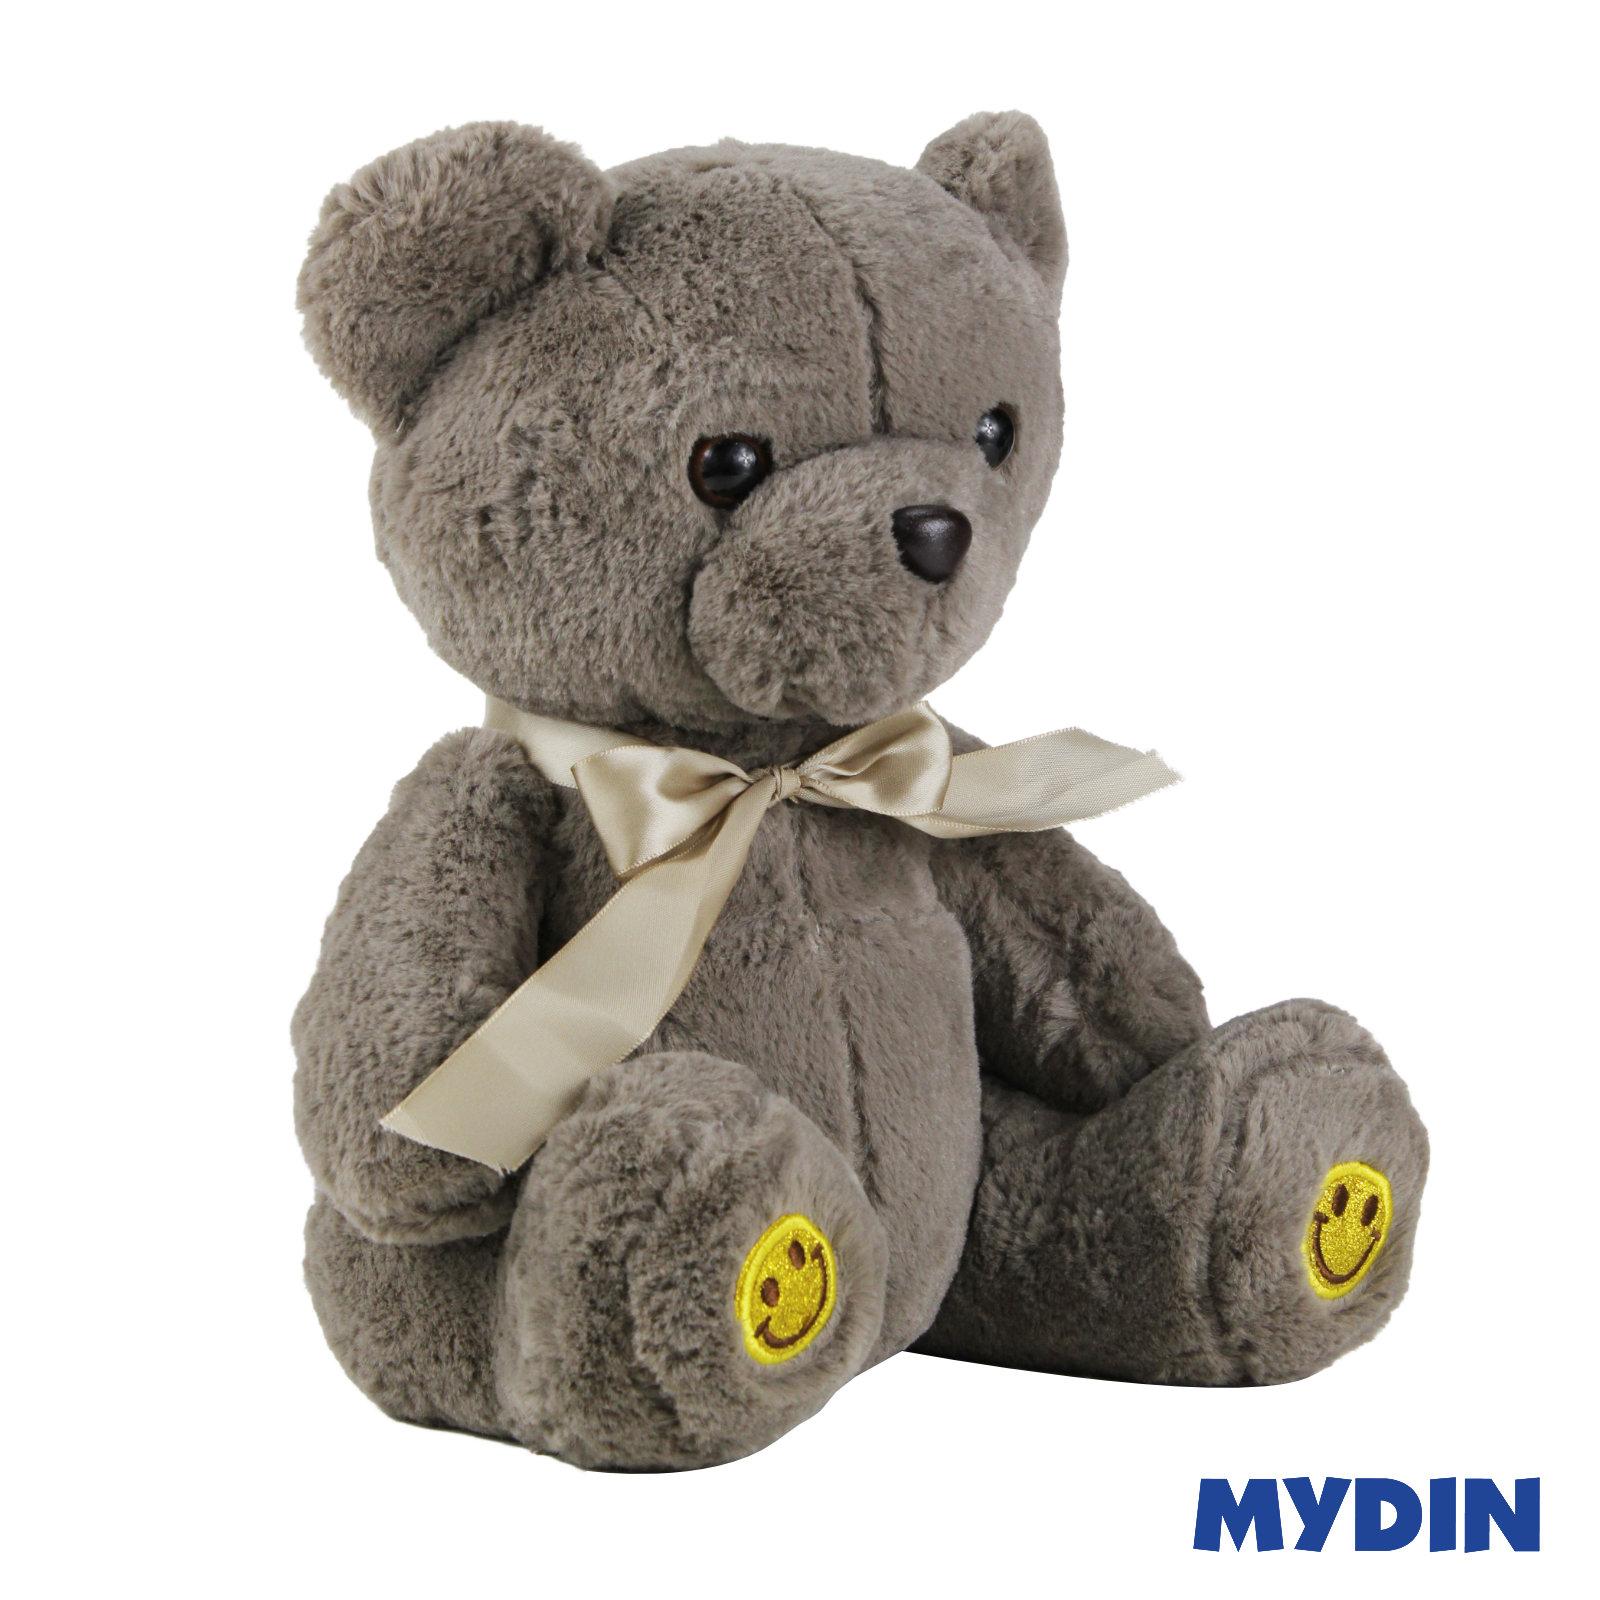 Soft Toys Bear (32cm) RVR1450-20